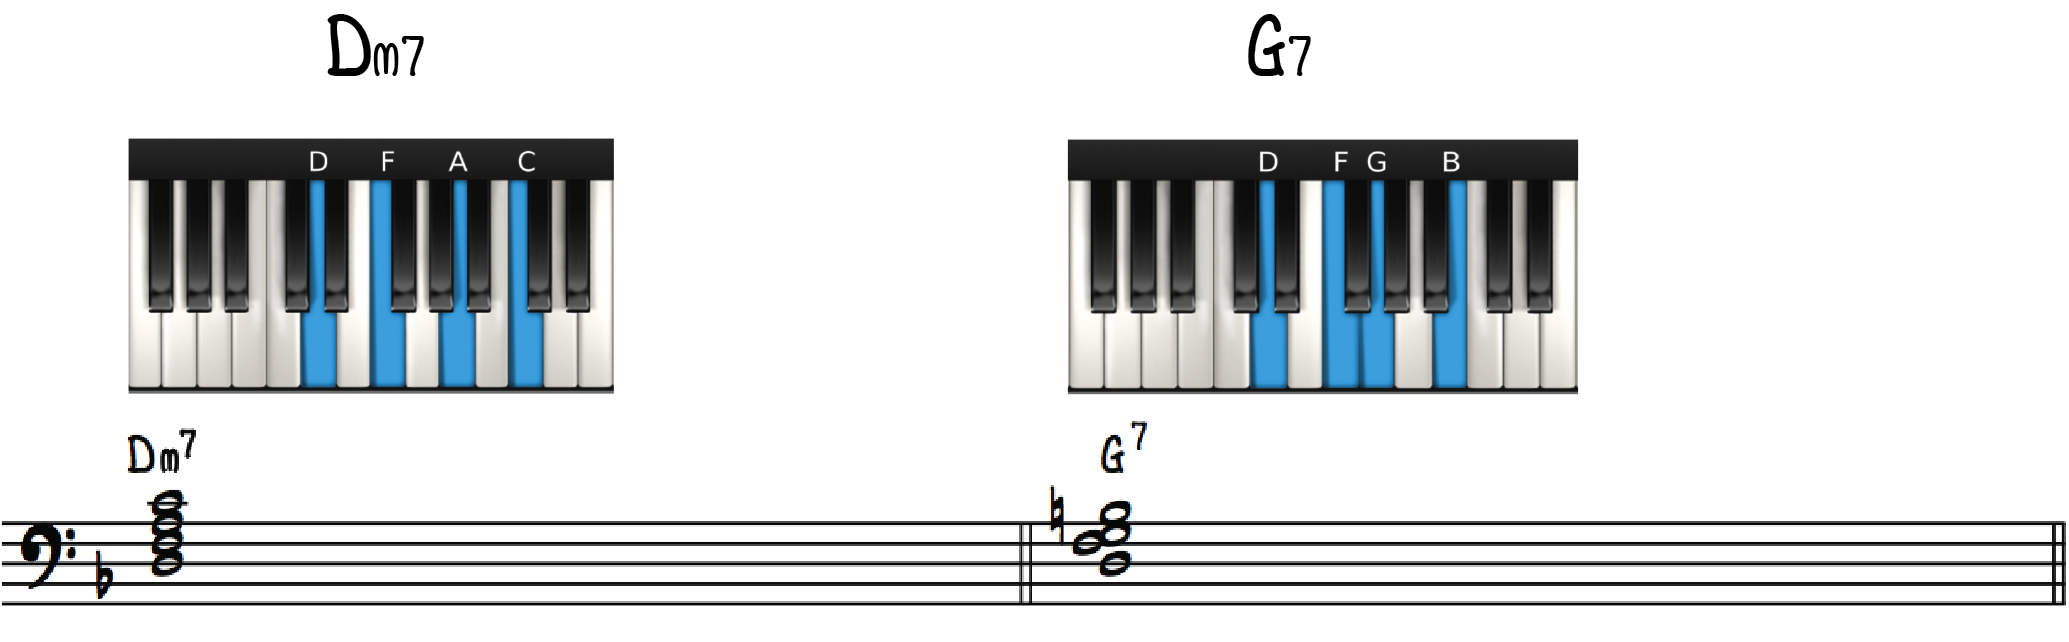 Beginner jazz piano left hand seventh chords—Dm7 to G7